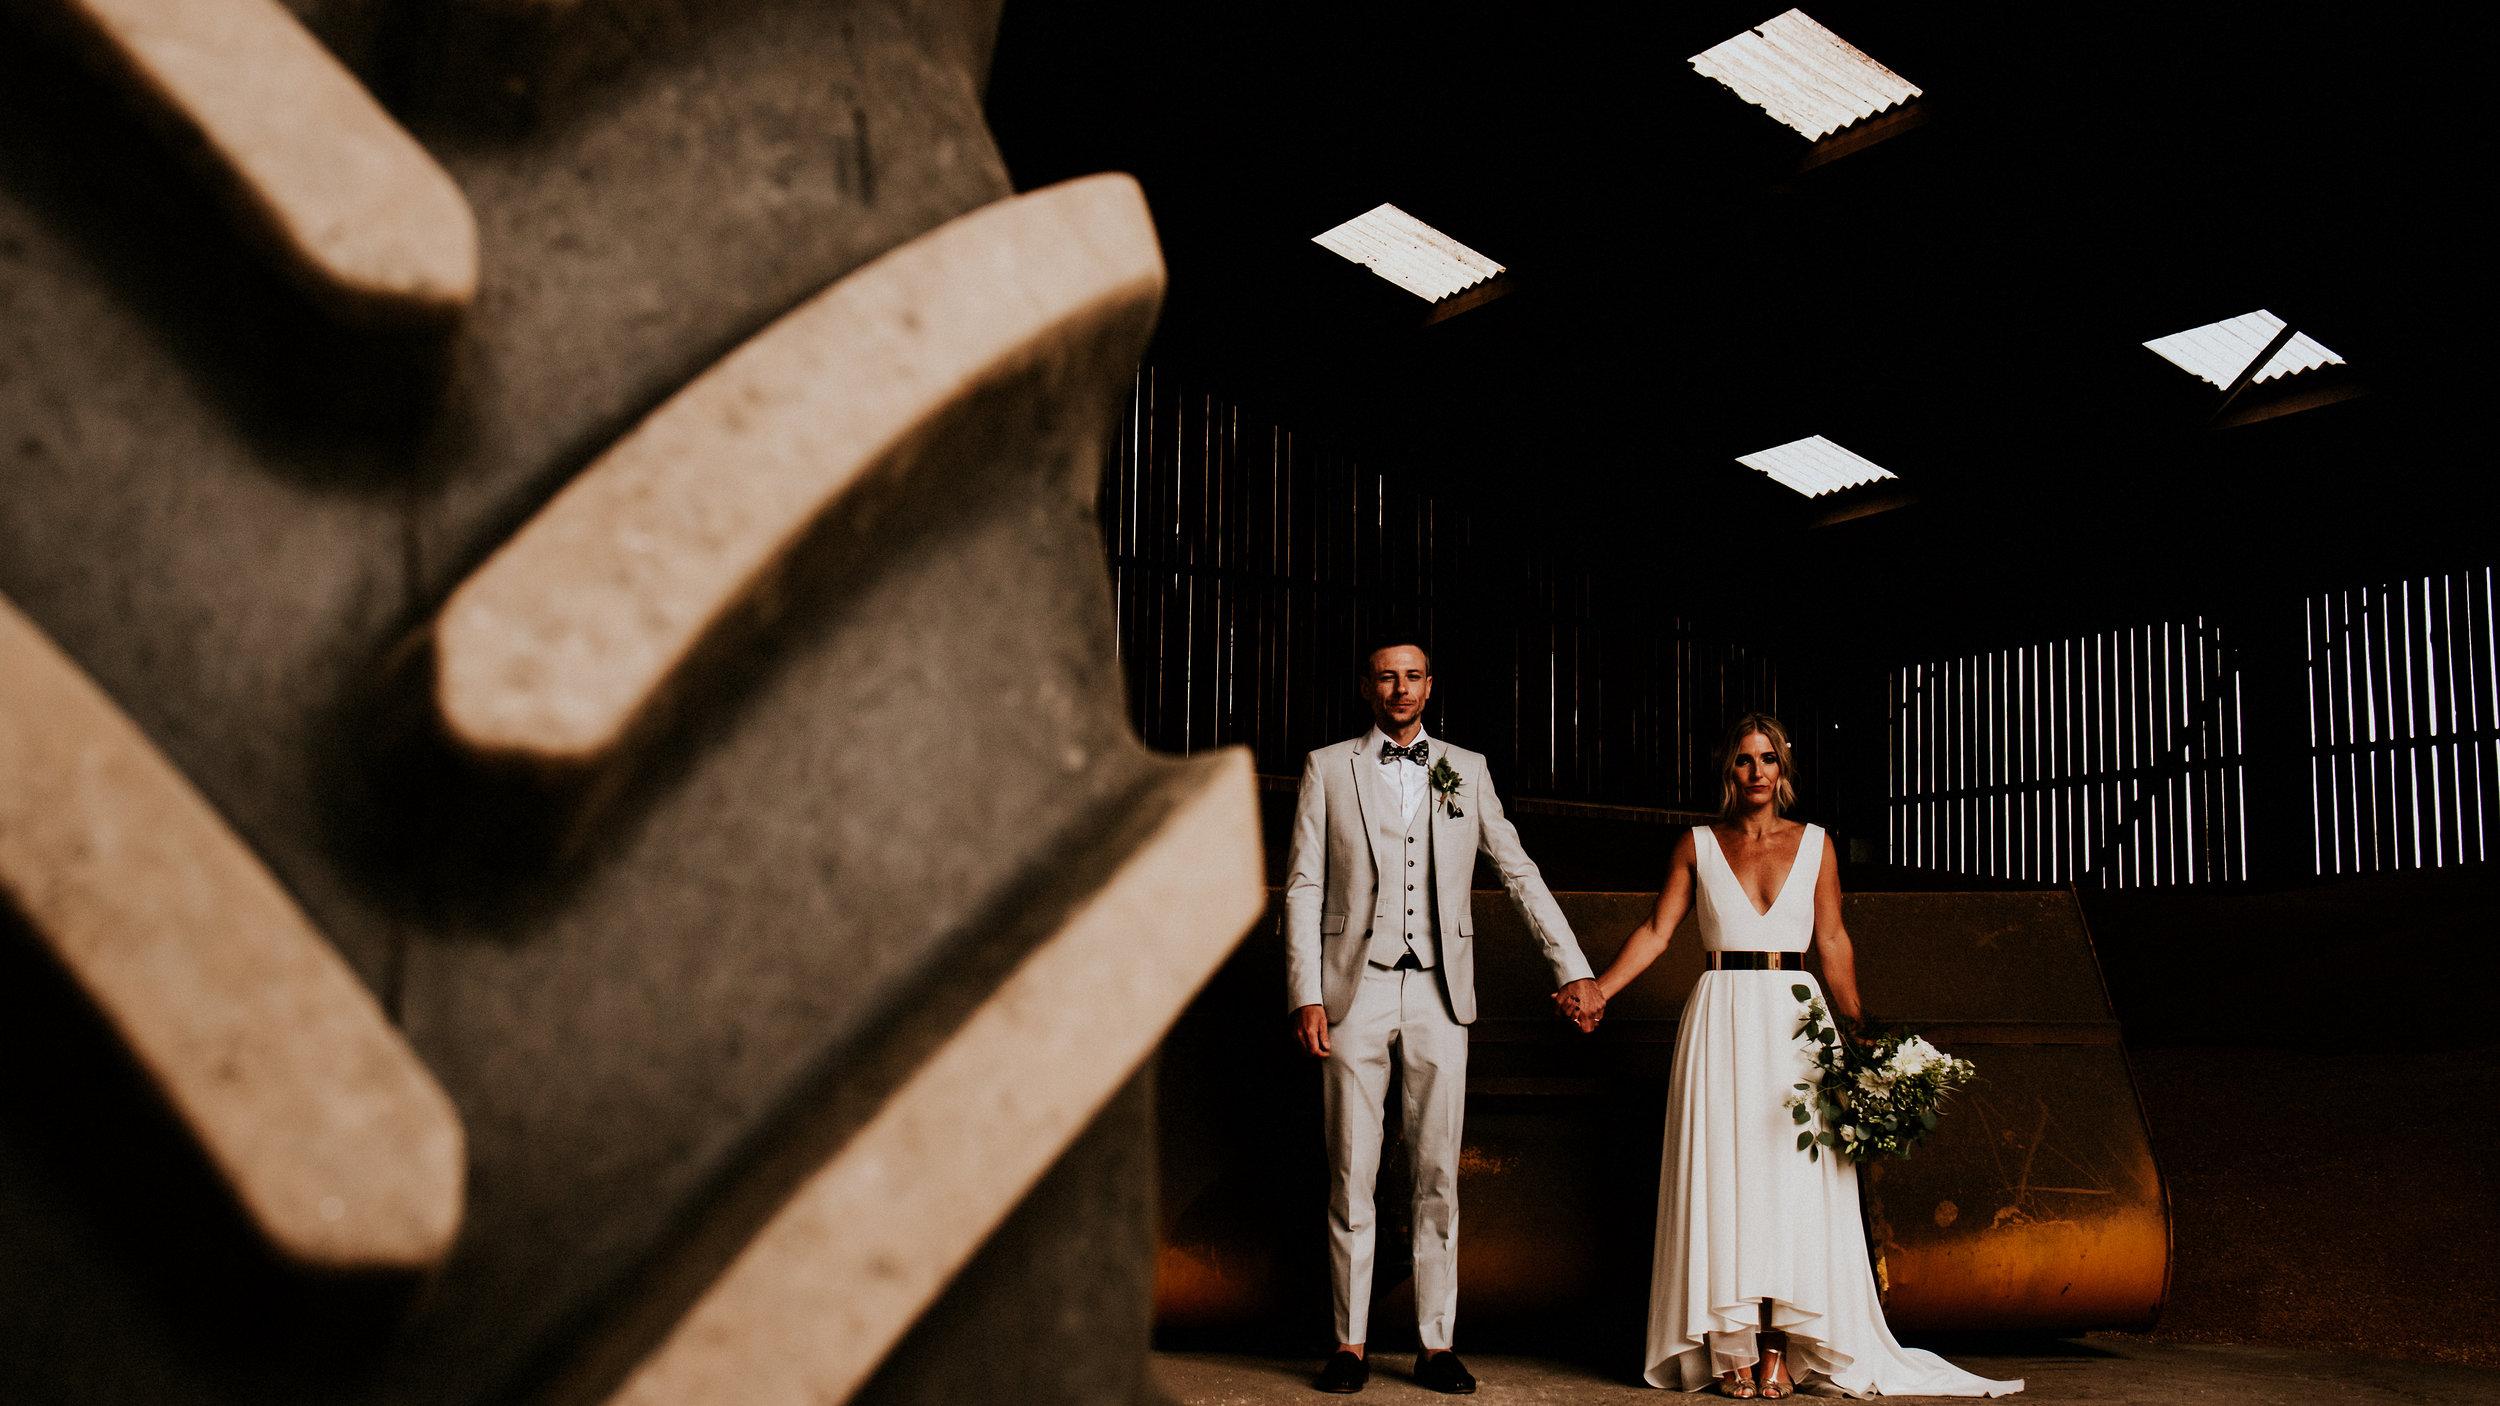 the-normans-york-wedding-photography-alternative-perspective-barn-wedding-inspiration-unique-colour-photo.jpg